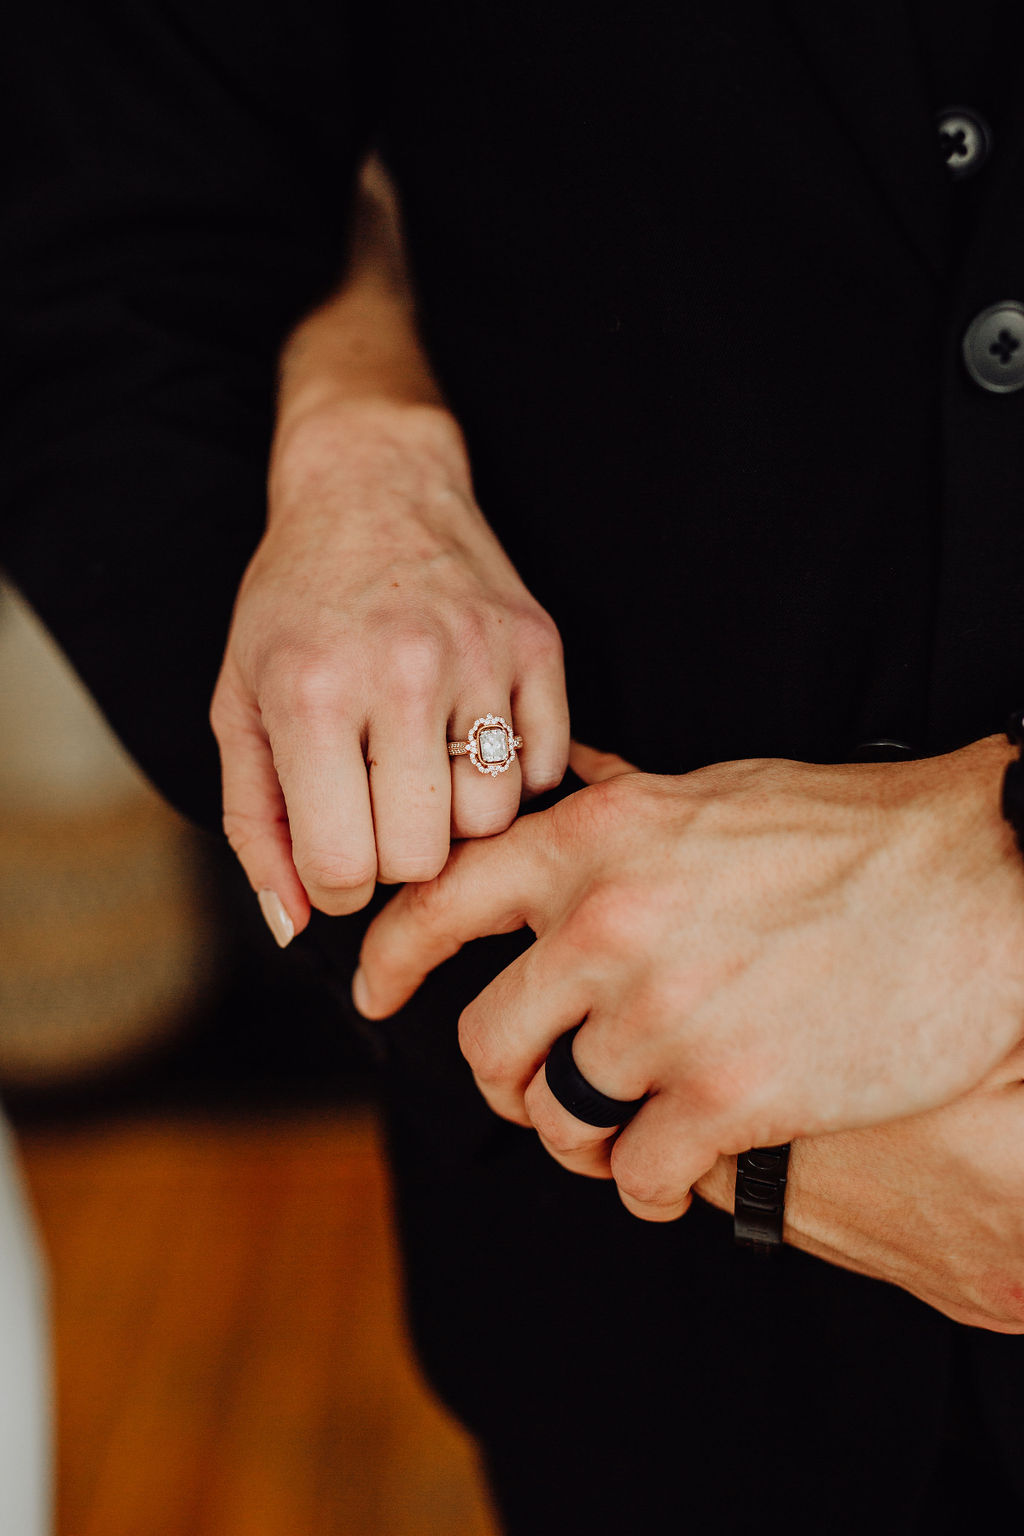 Our Intimate Courthouse Wedding | Vintage, Halo, Rose Gold Engagement Ring | Miranda Schroeder Blog | www.mirandaschroeder.com